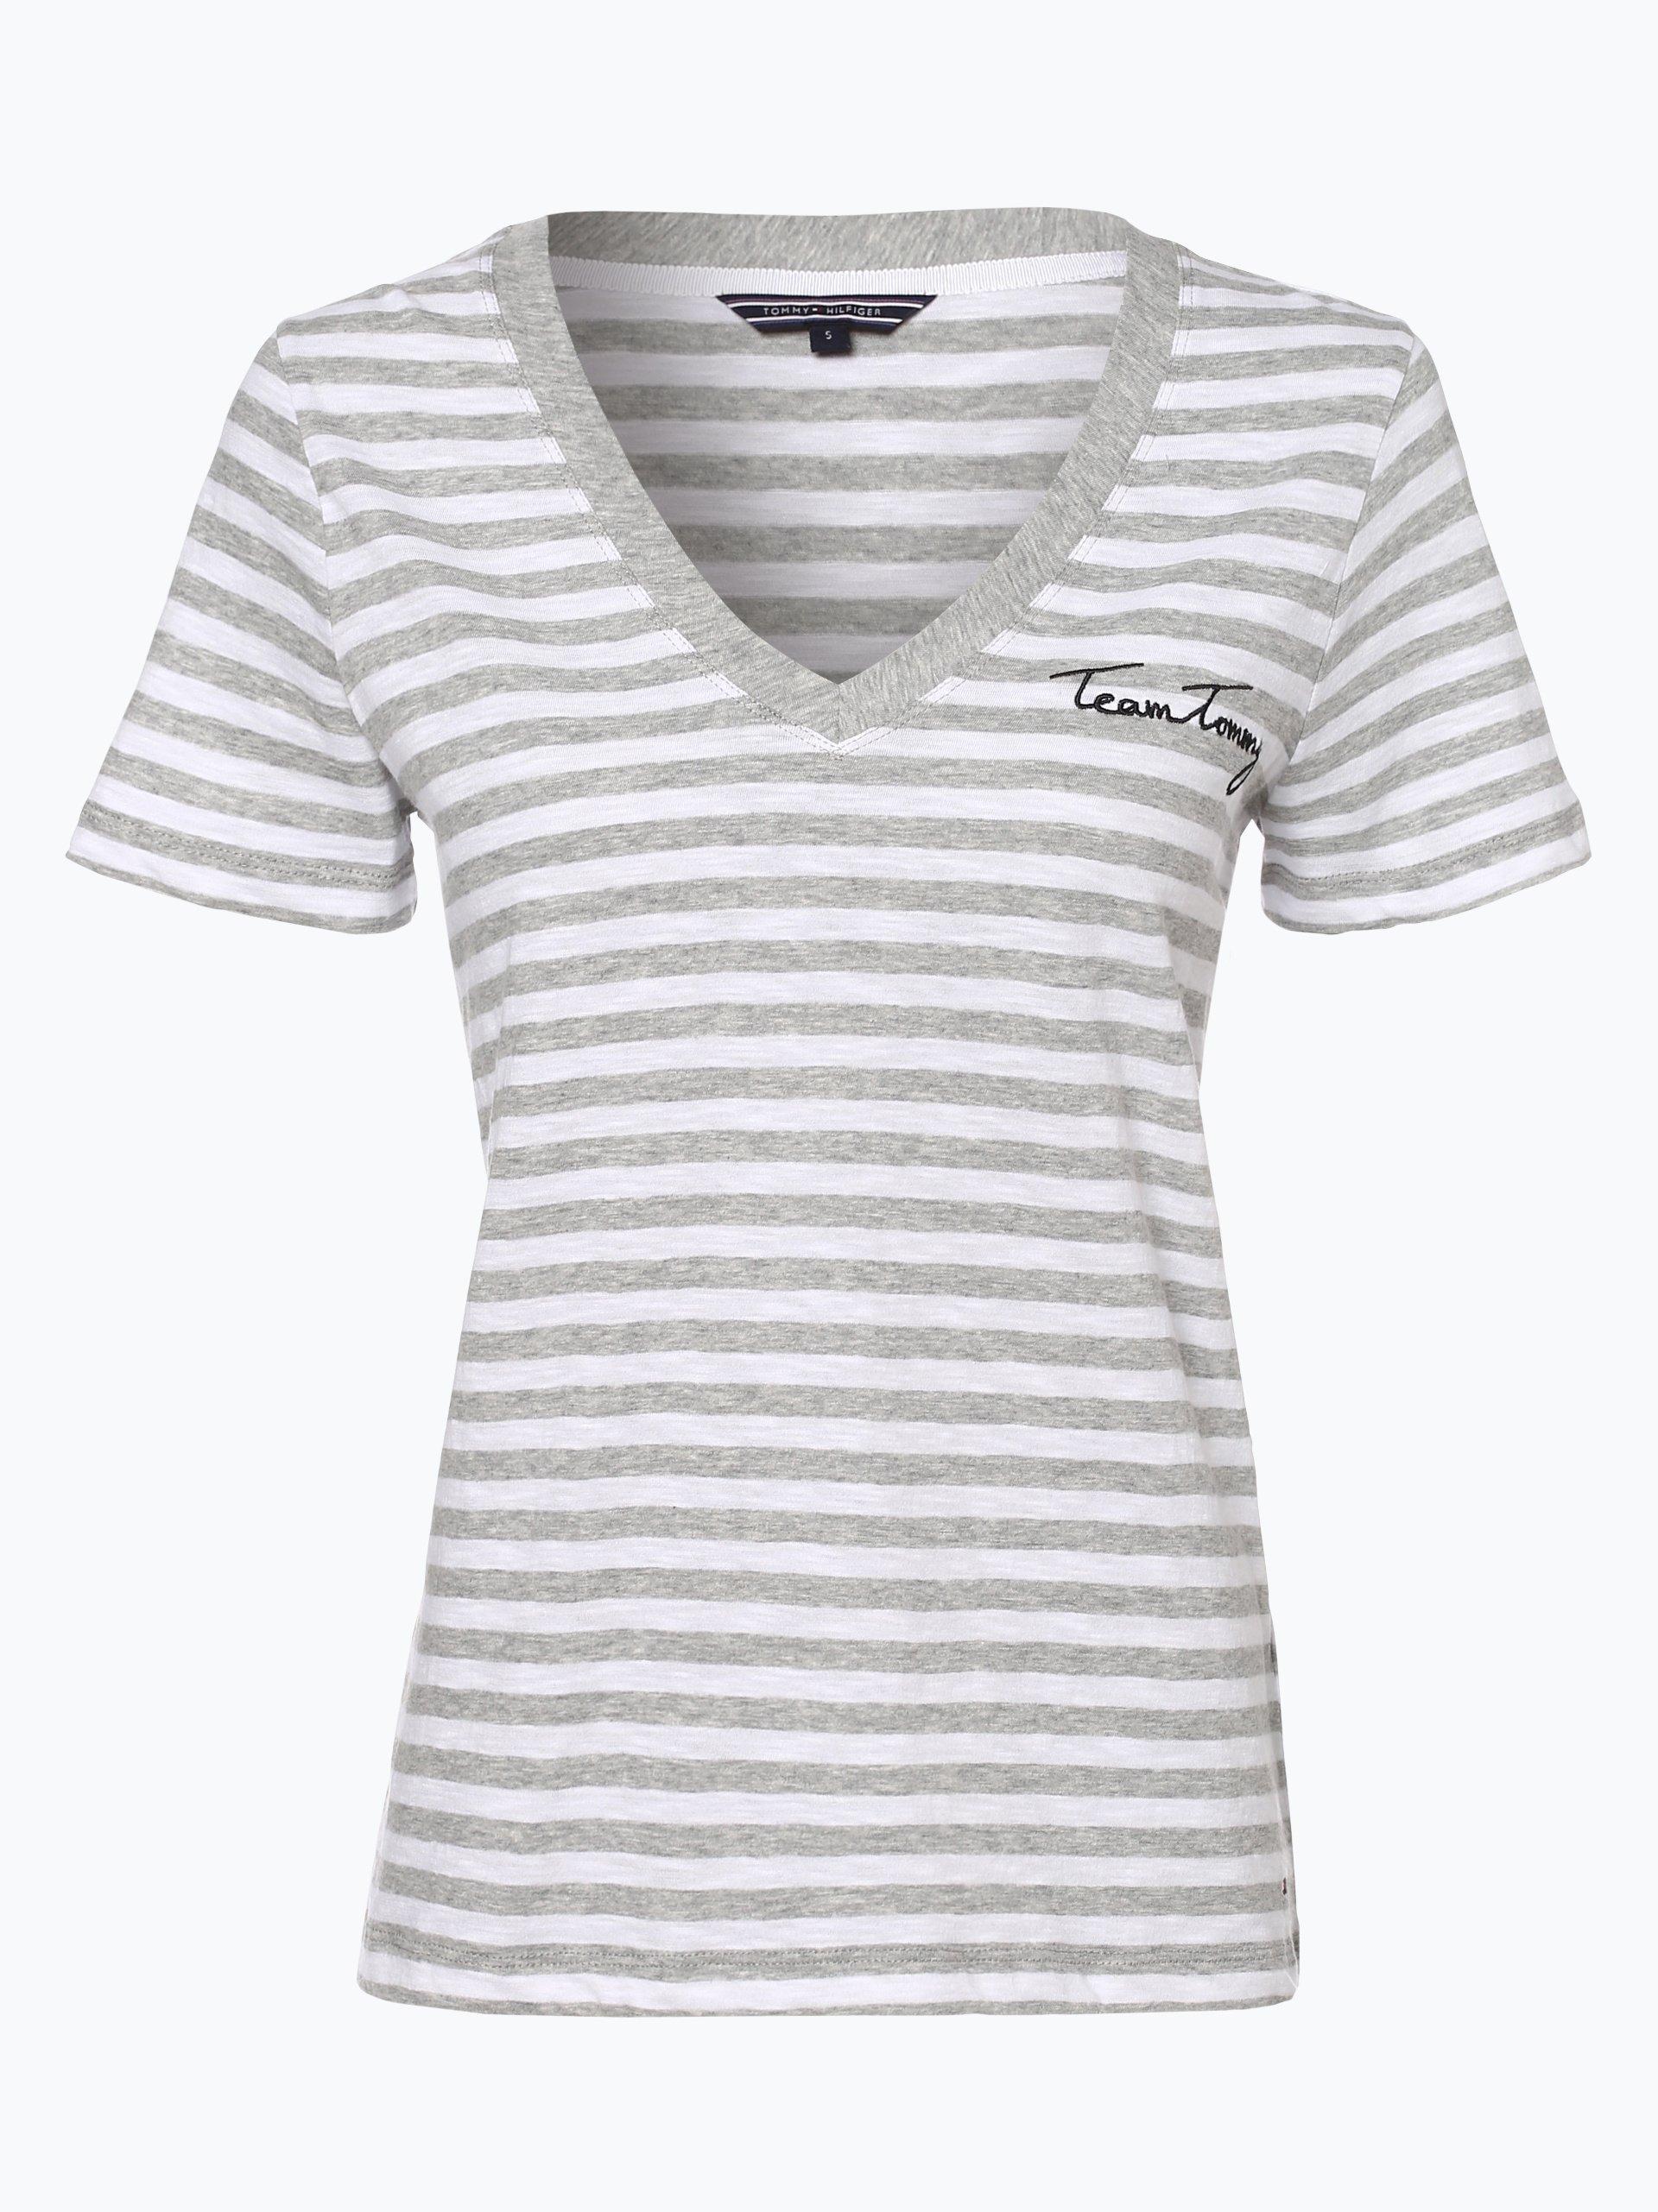 tommy hilfiger damen t shirt grau gestreift online kaufen. Black Bedroom Furniture Sets. Home Design Ideas